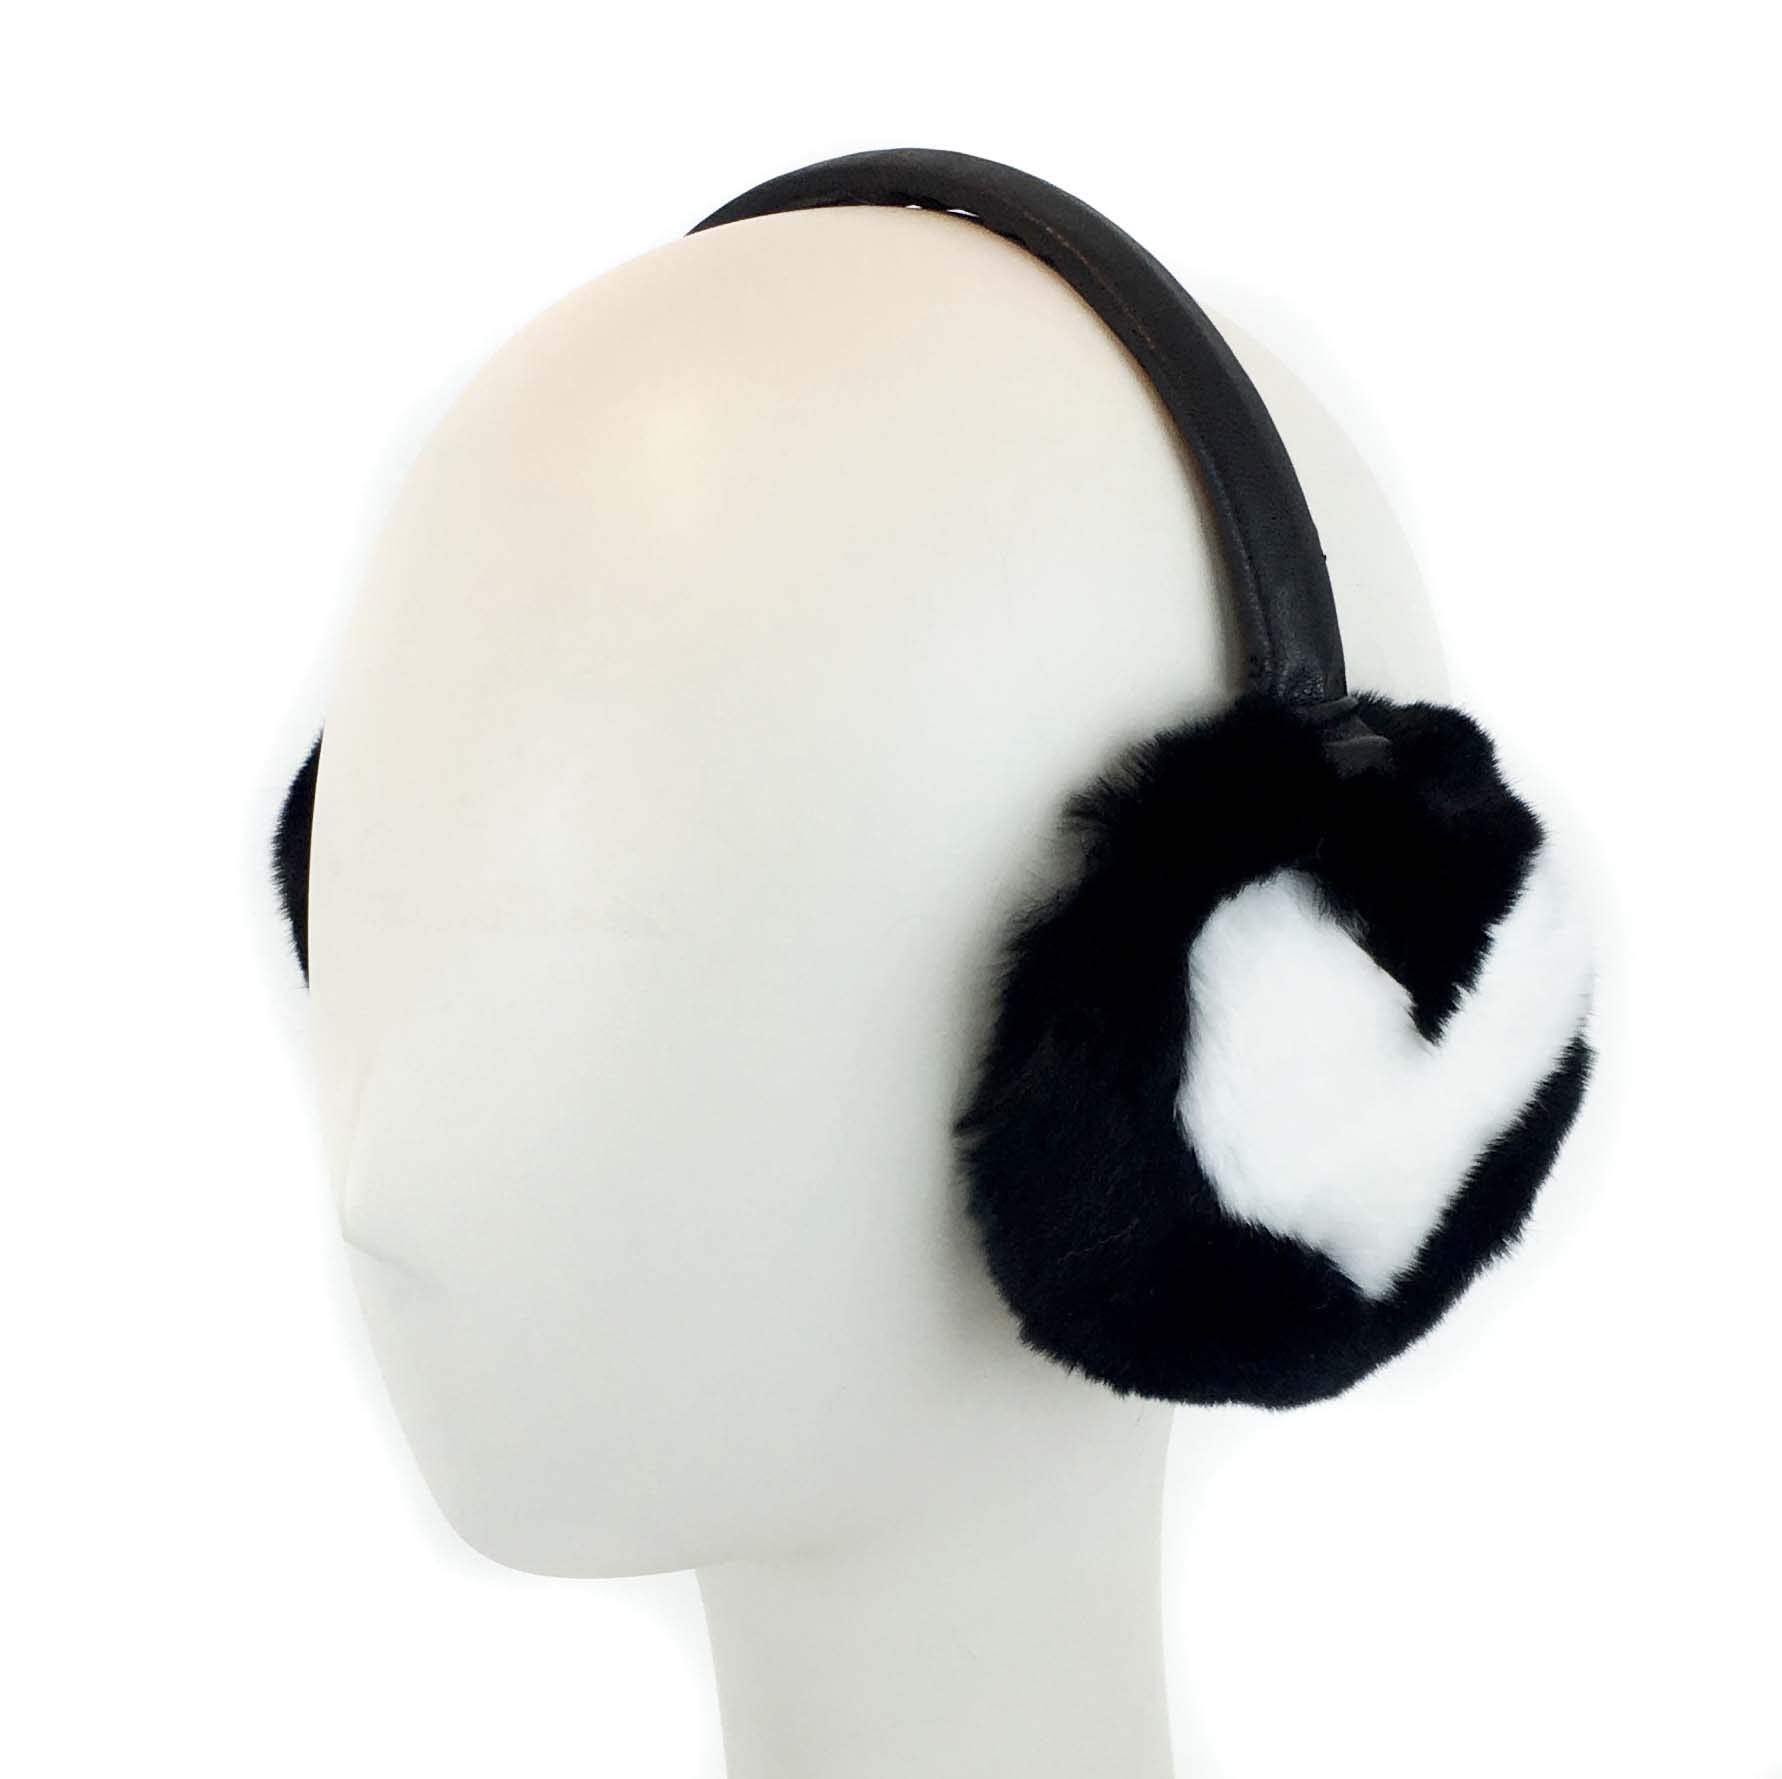 Surell Heart Rex Rabbit Fur Earmuff with Adjustable Leather Band - Winter Ear Warmer